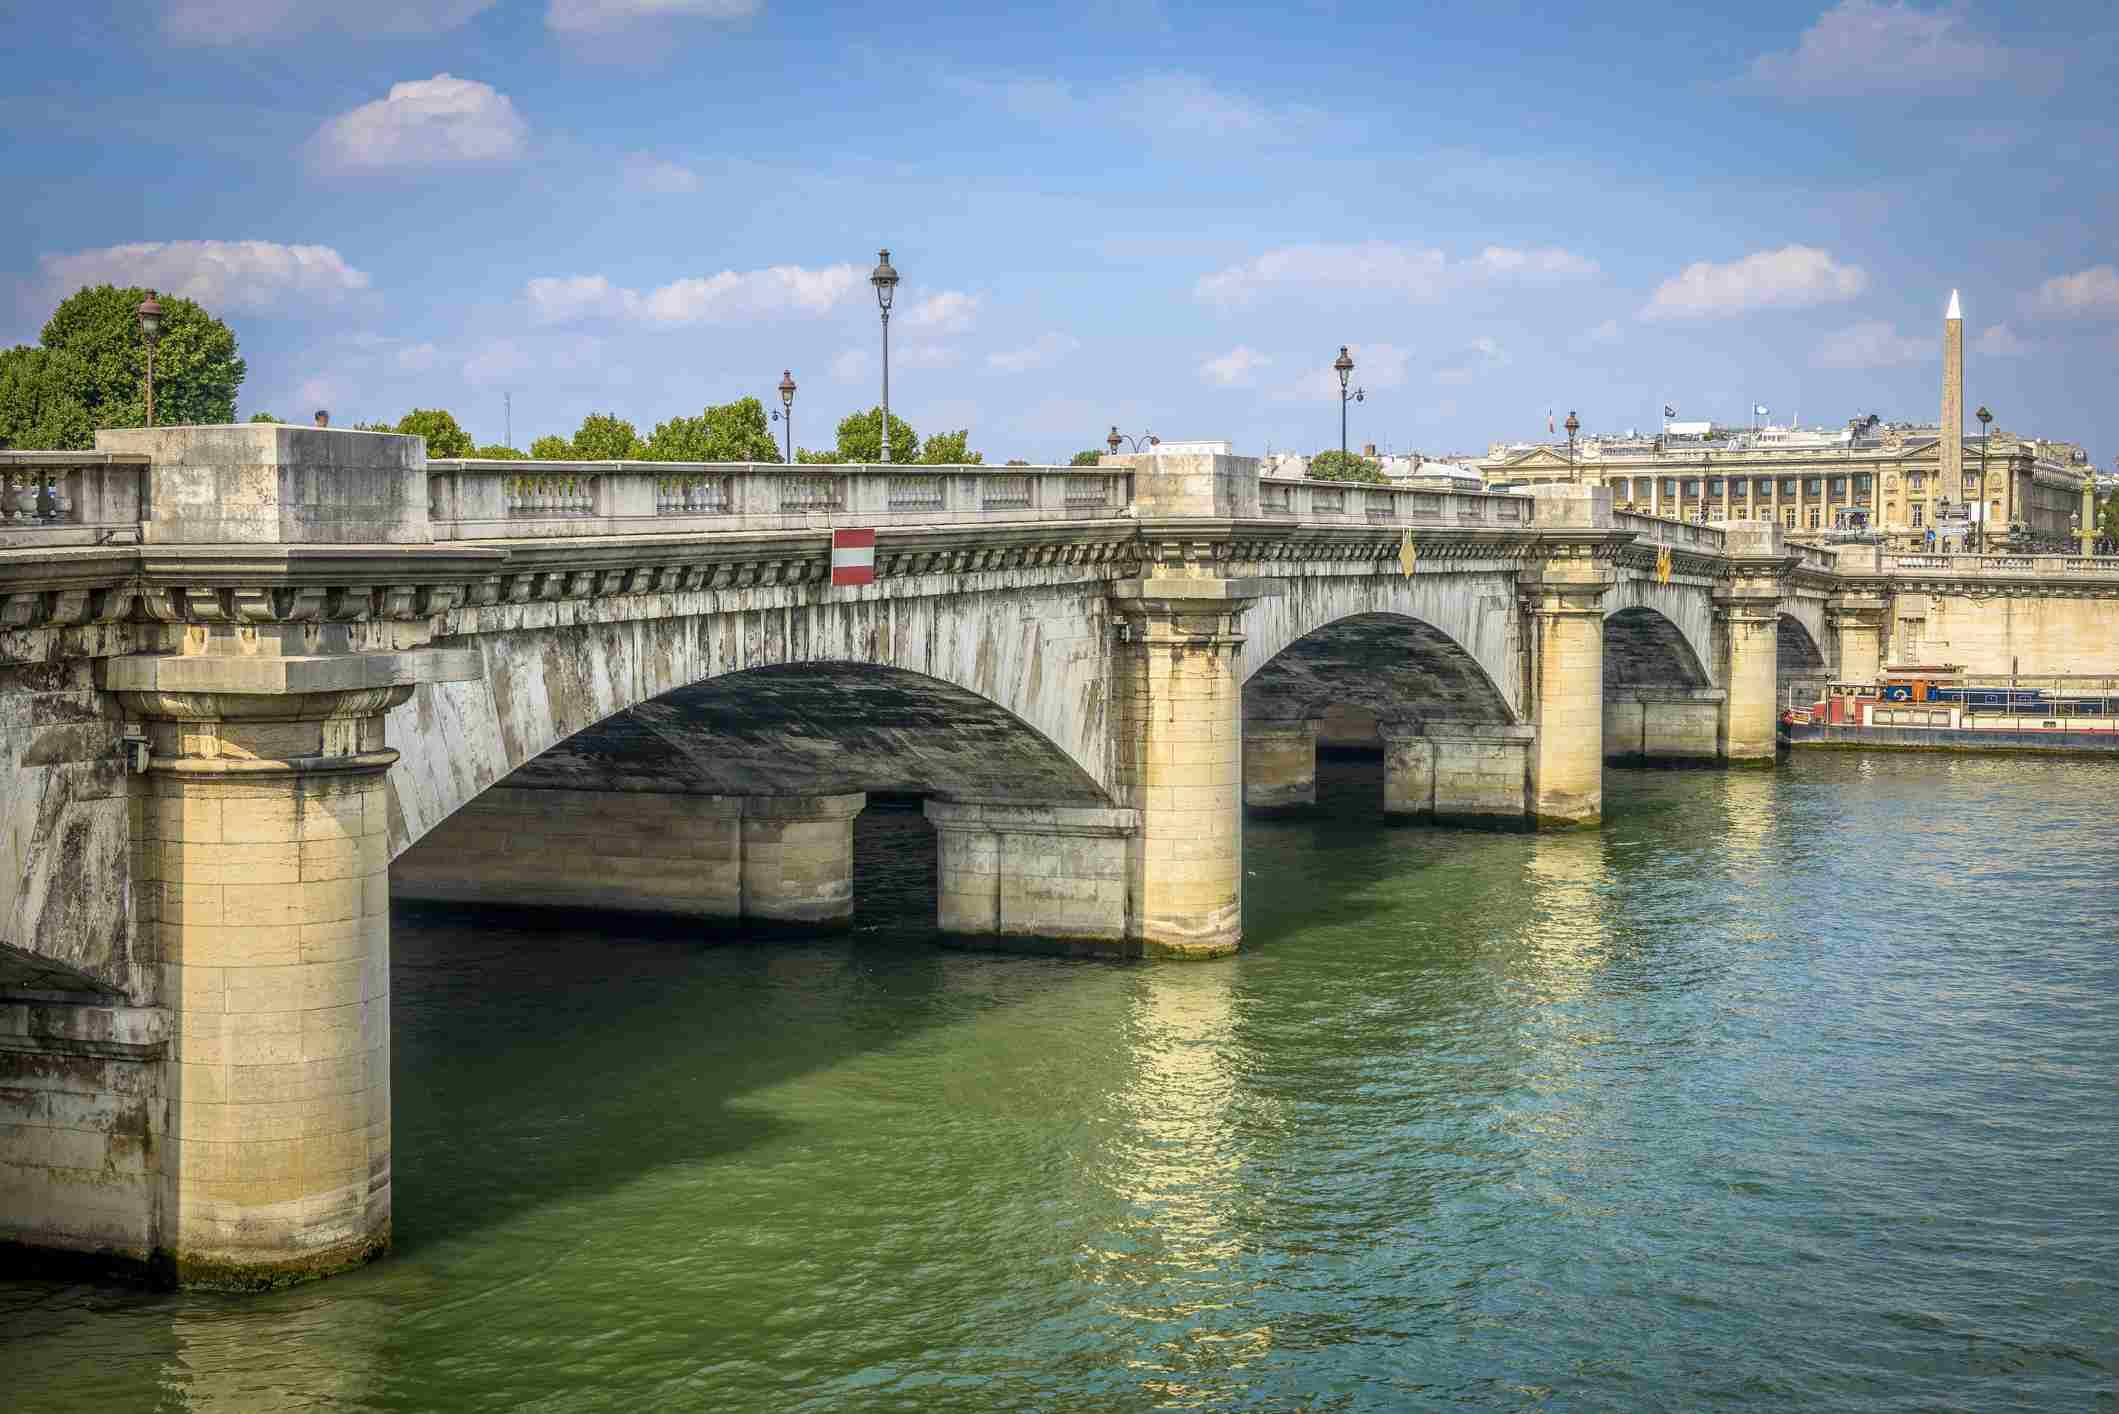 The Pont de la Concorde in Paris, France